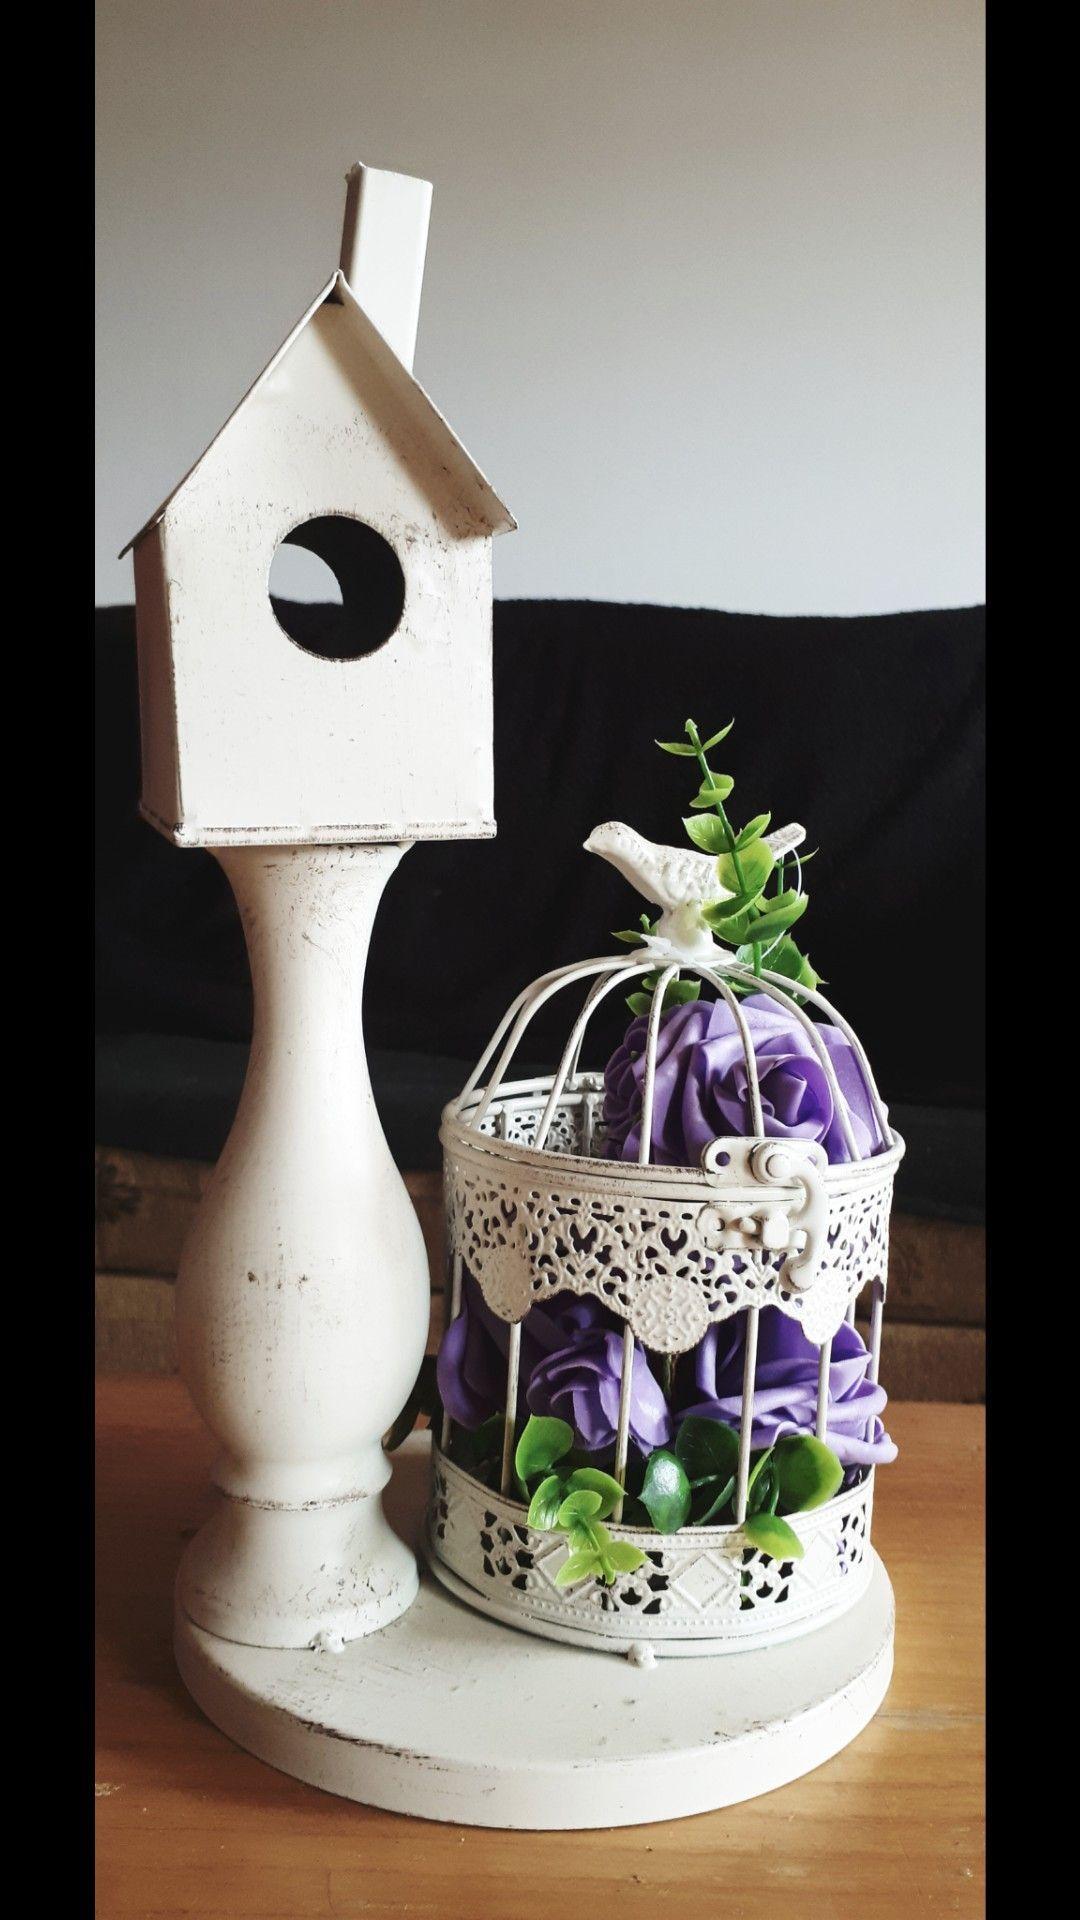 Birdhouse Artificial Flowers Artificial Greenery Birdcage Light Decoration Simple Weding